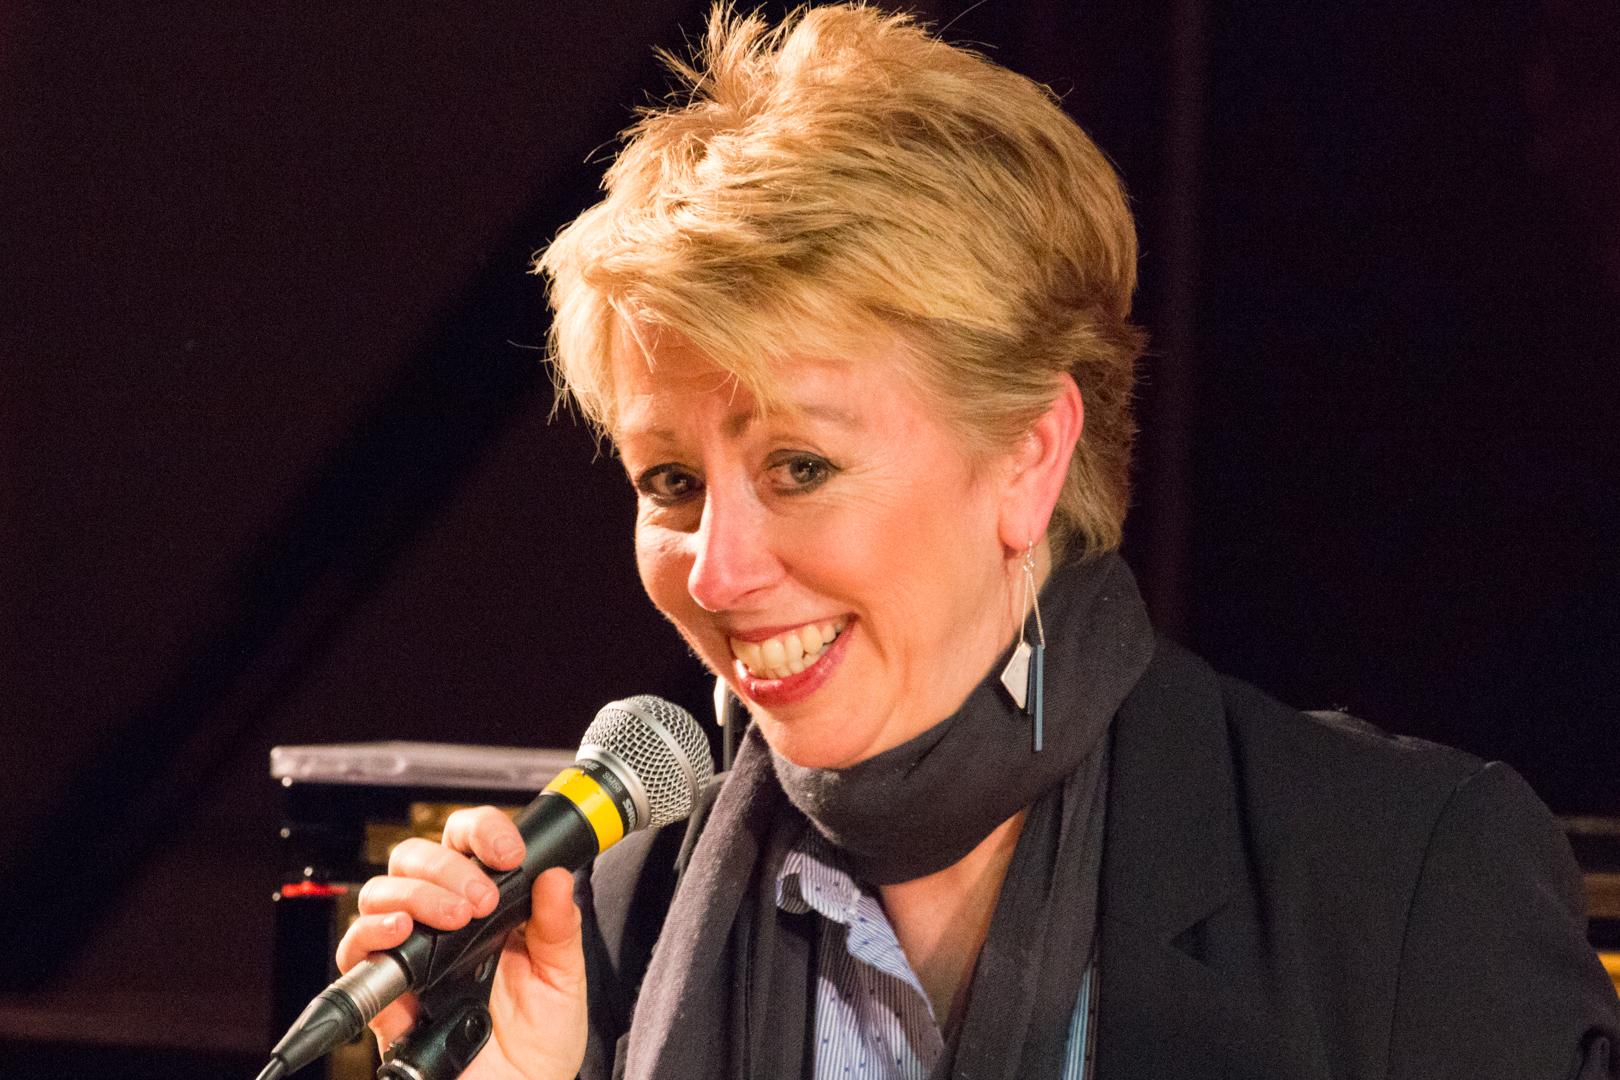 Nikki Iles performing at Fleet Jazz on 19th Feb 2019.